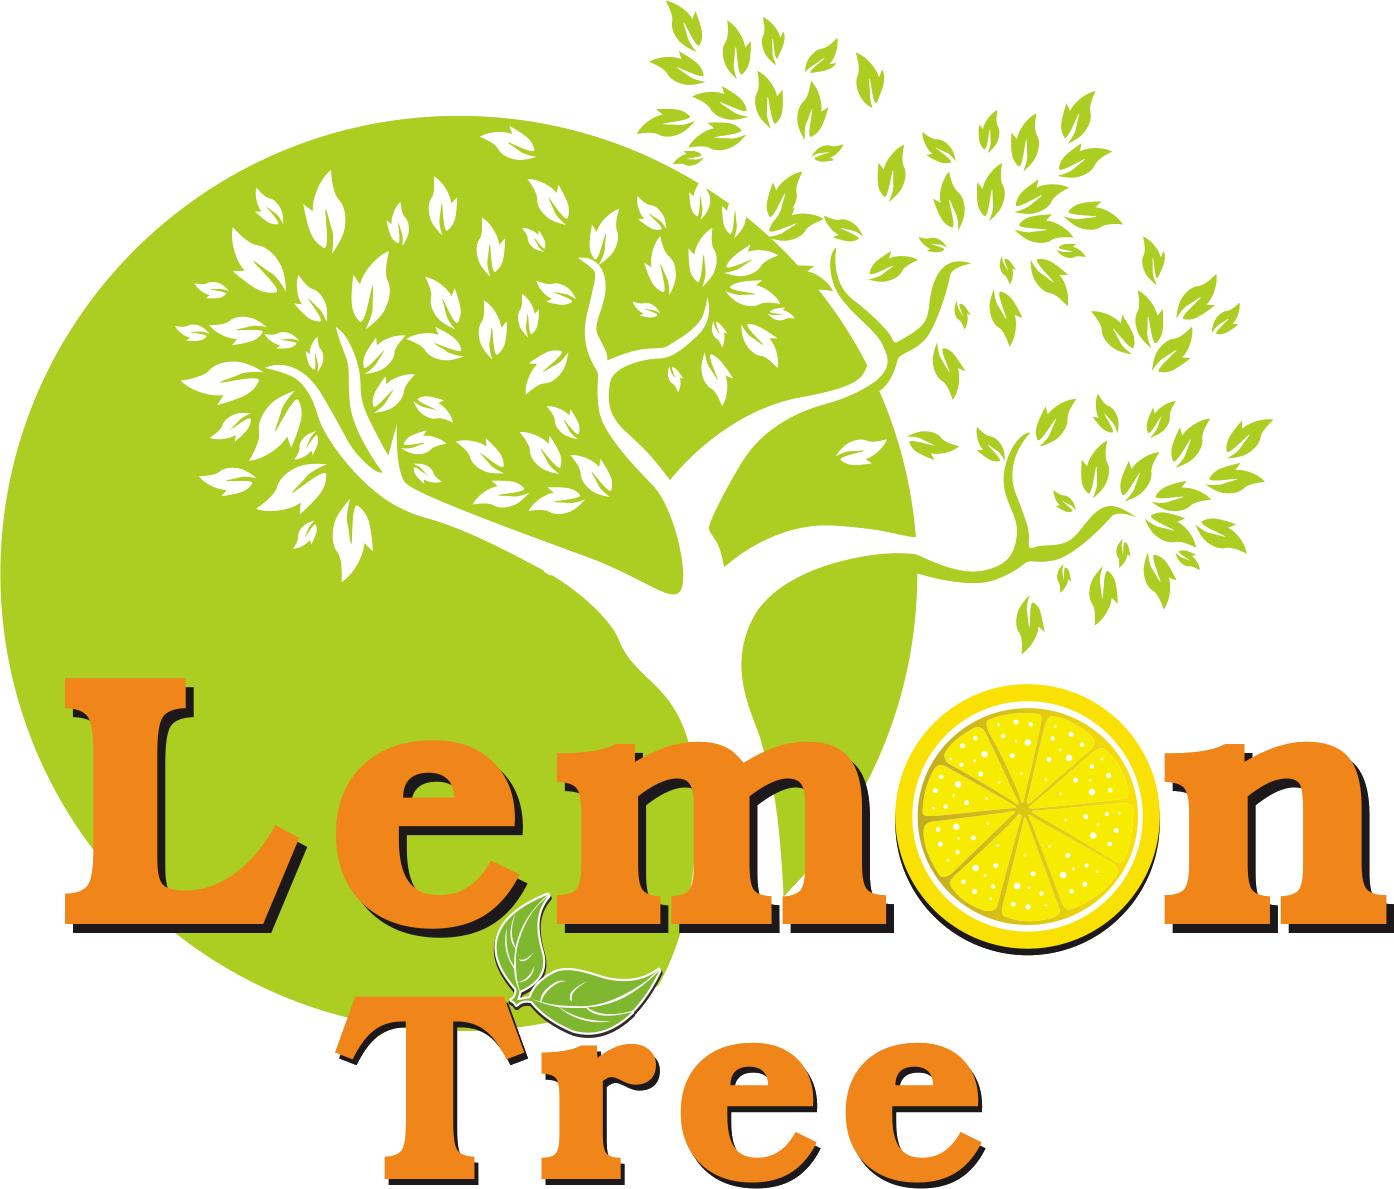 Lemon tree clipart image download Nice Fools Garden Lemon Tree Composition - Beautiful Garden ... image download